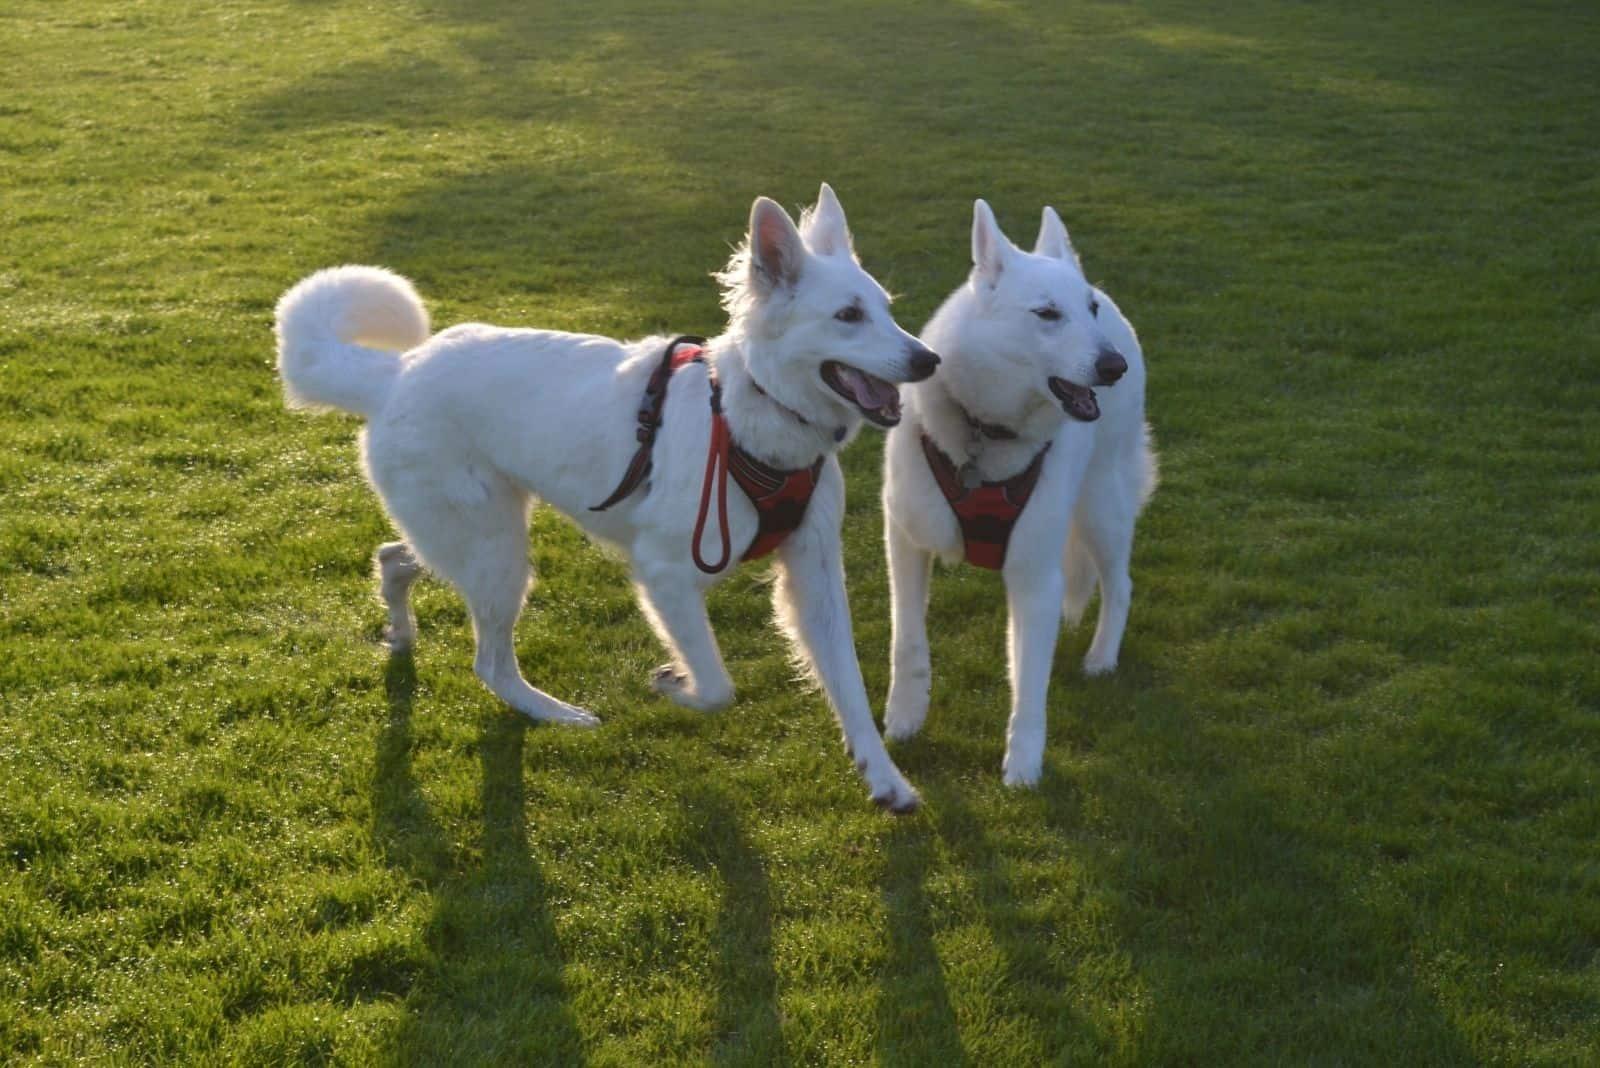 white german shepherd dogs in the playground